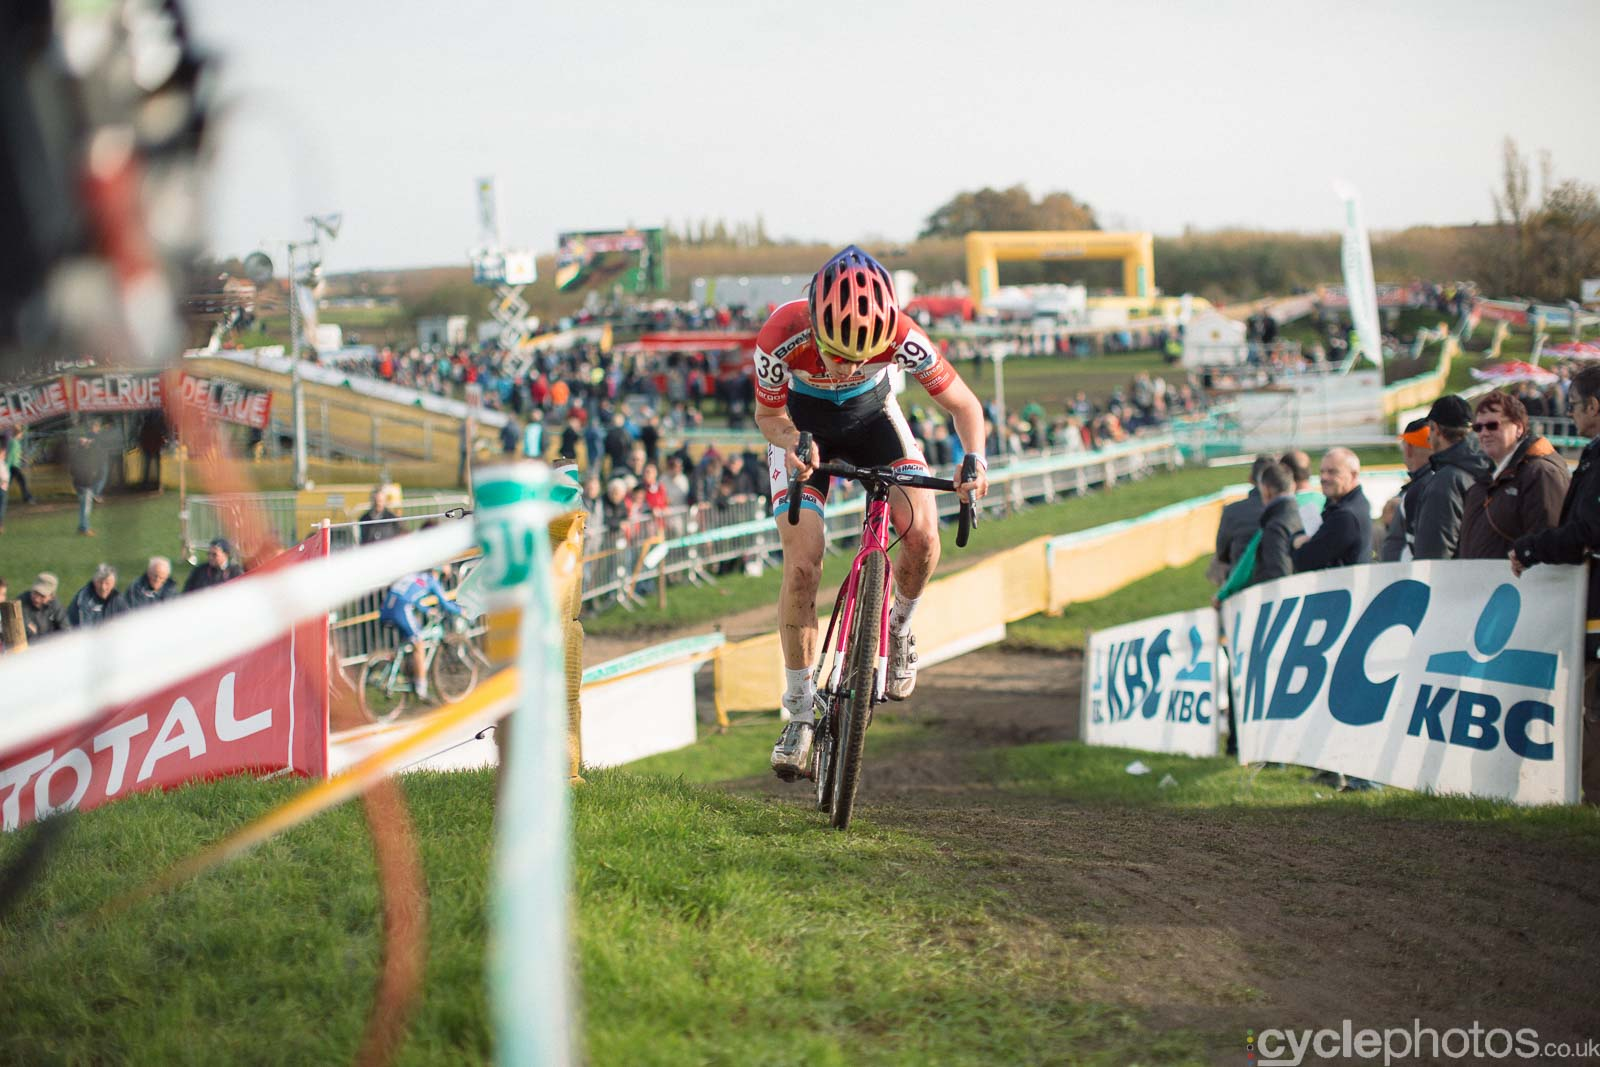 2015-cyclephotos-cyclocross-ruddervoorde-140223-christine-majerus